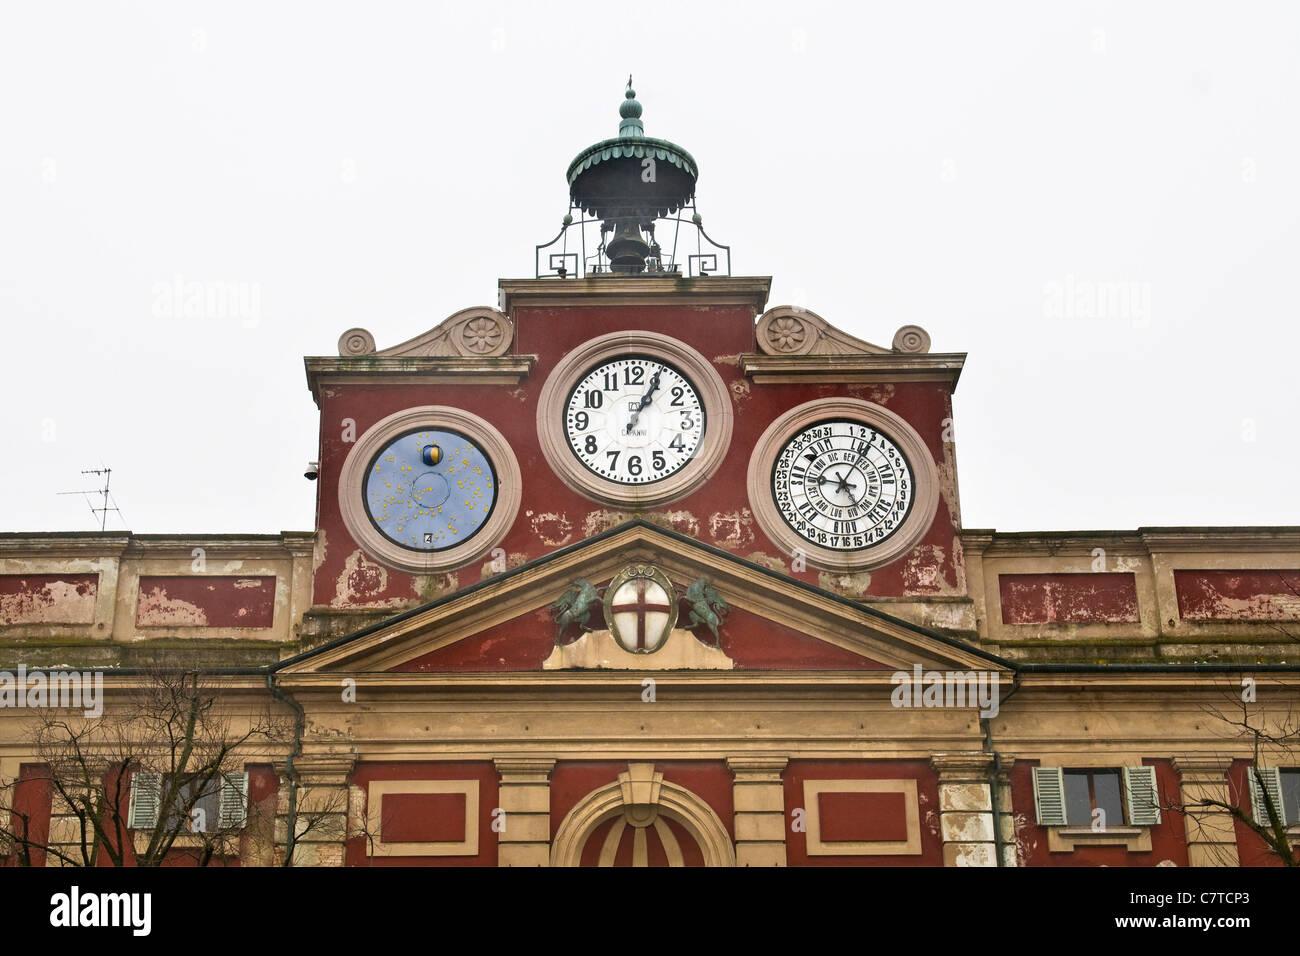 Italy, Piedmont, Alessandria, Piazza Libertà, the city hall - Stock Image